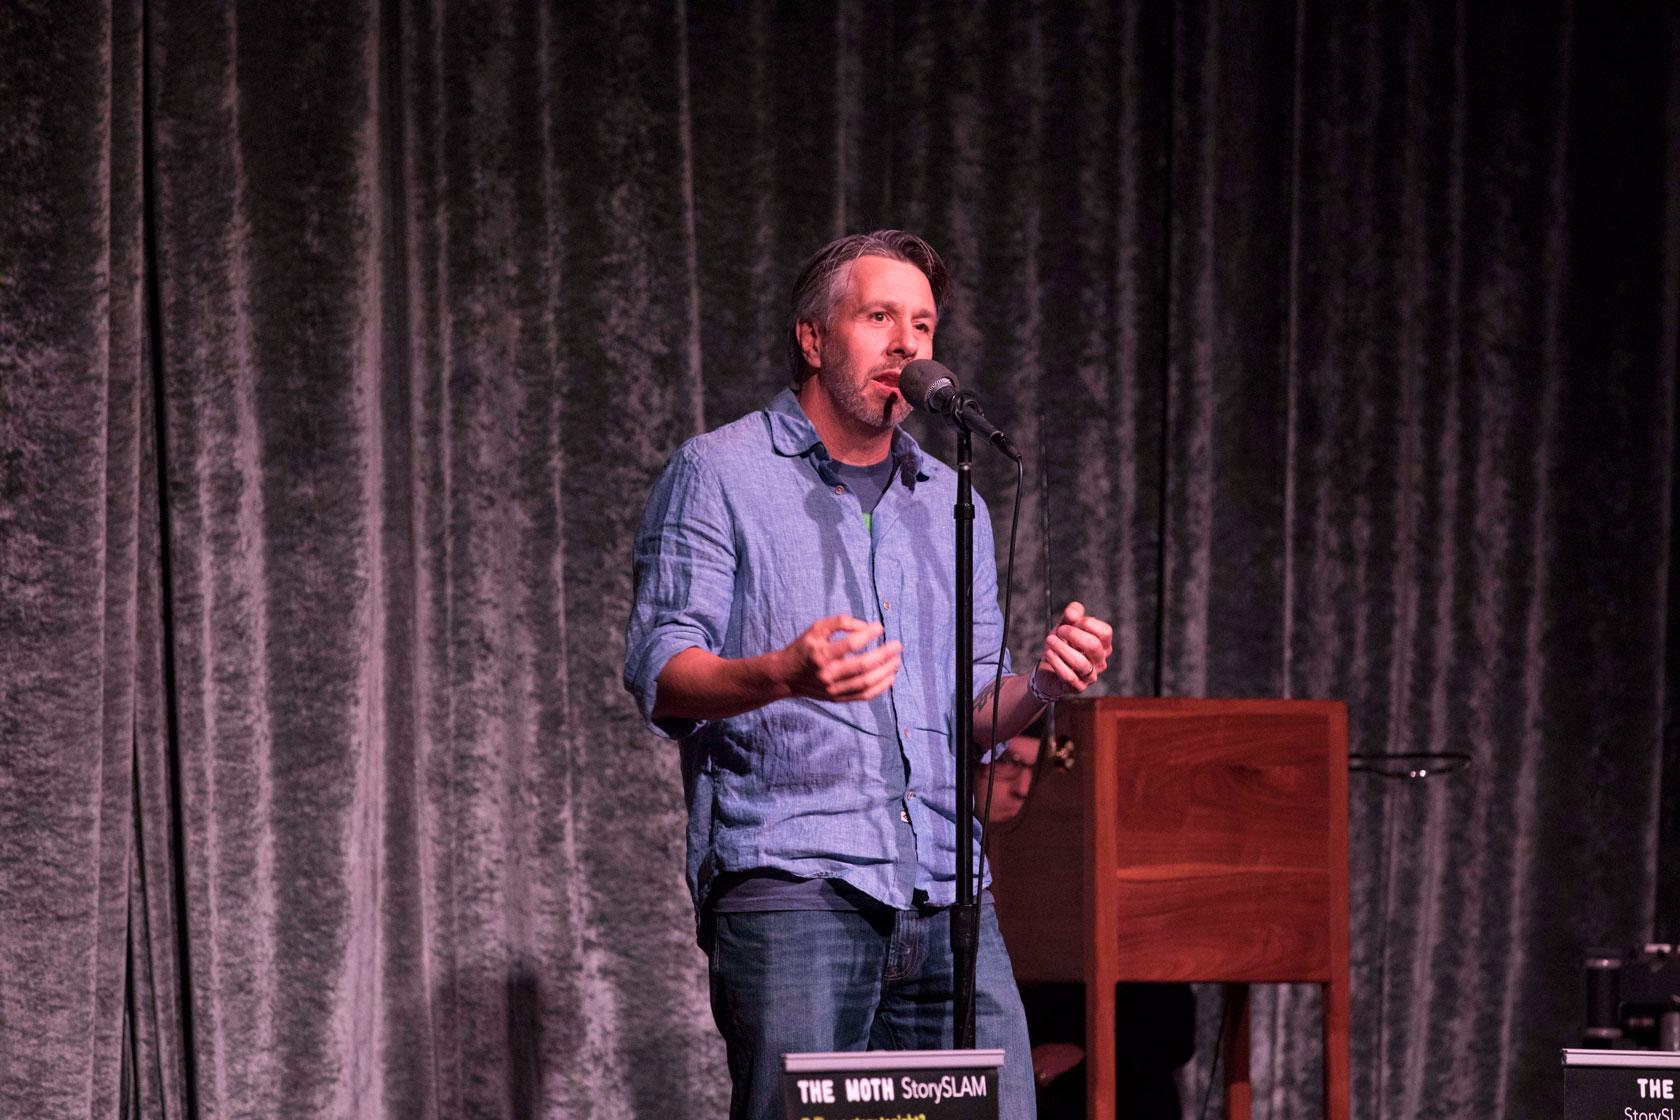 Storyteller Matthew Struski, live at The Moth GrandSLAM, October 22nd, 2018. (Photo credit: Ricky Steel & The Moth)